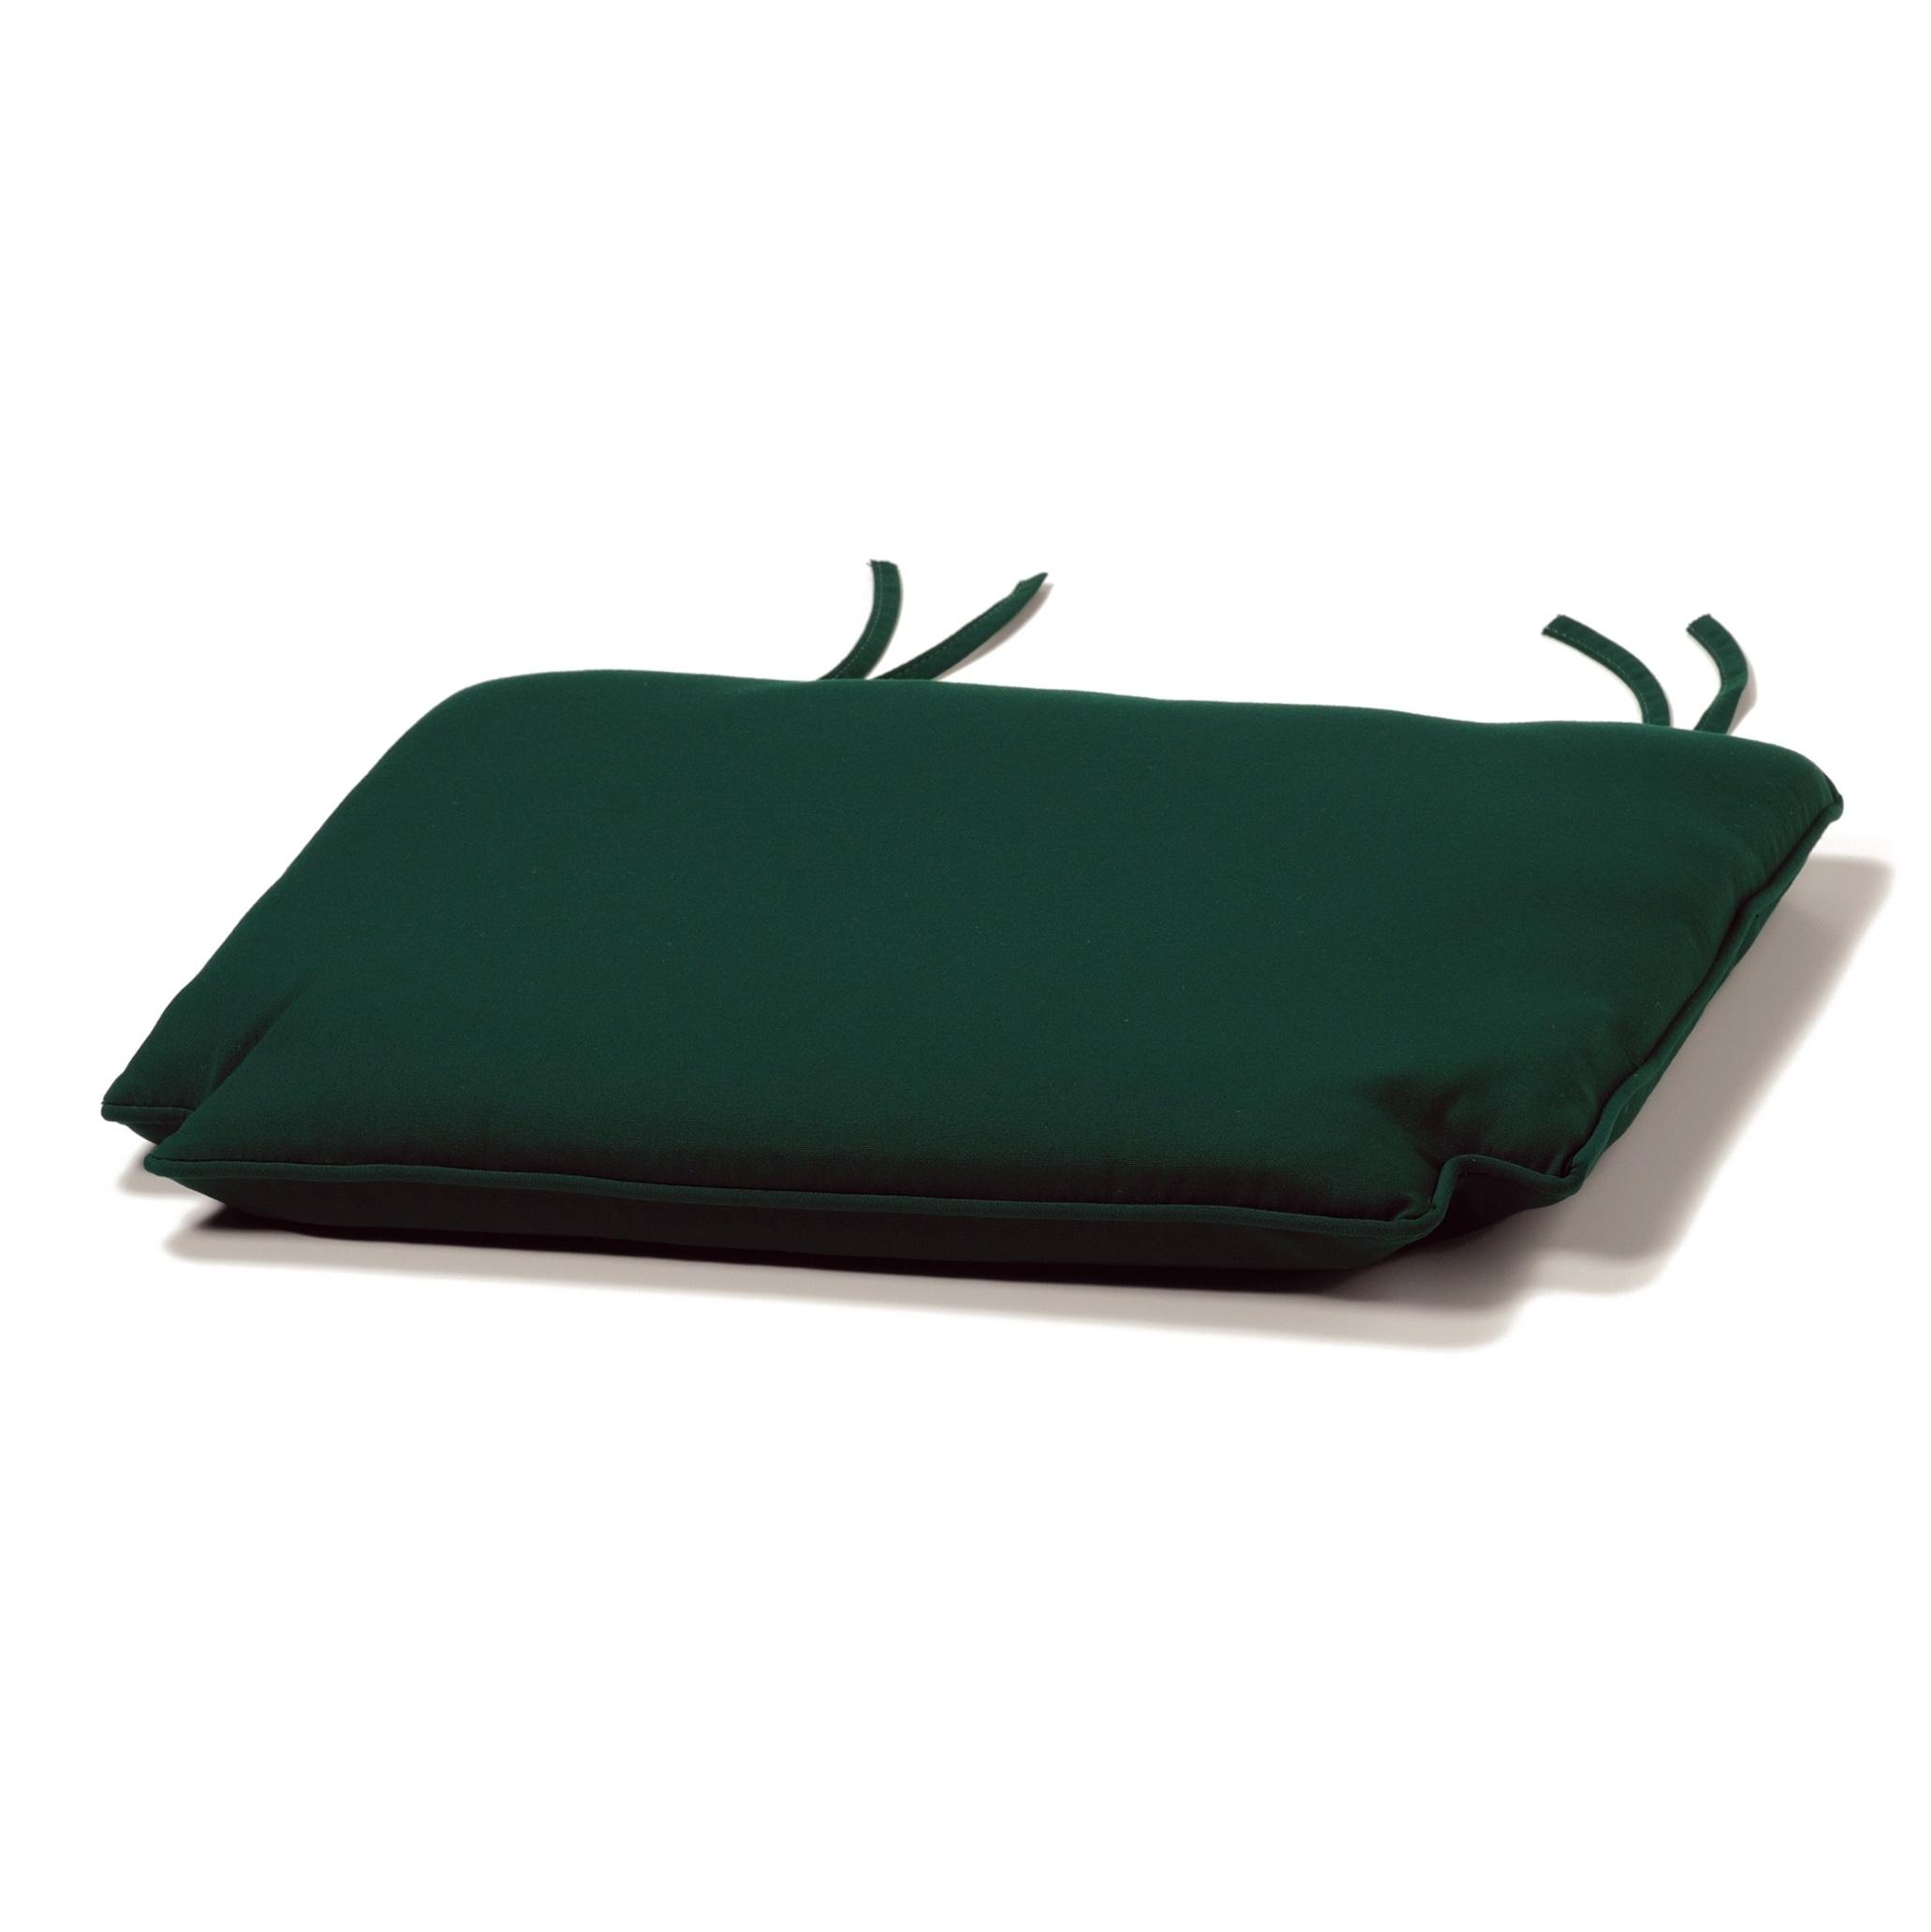 Replacement Cushions For Patio Furniture Sunbrella